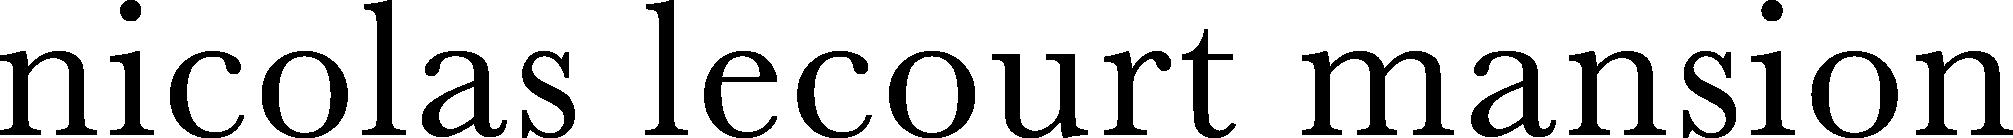 logo NLM.png